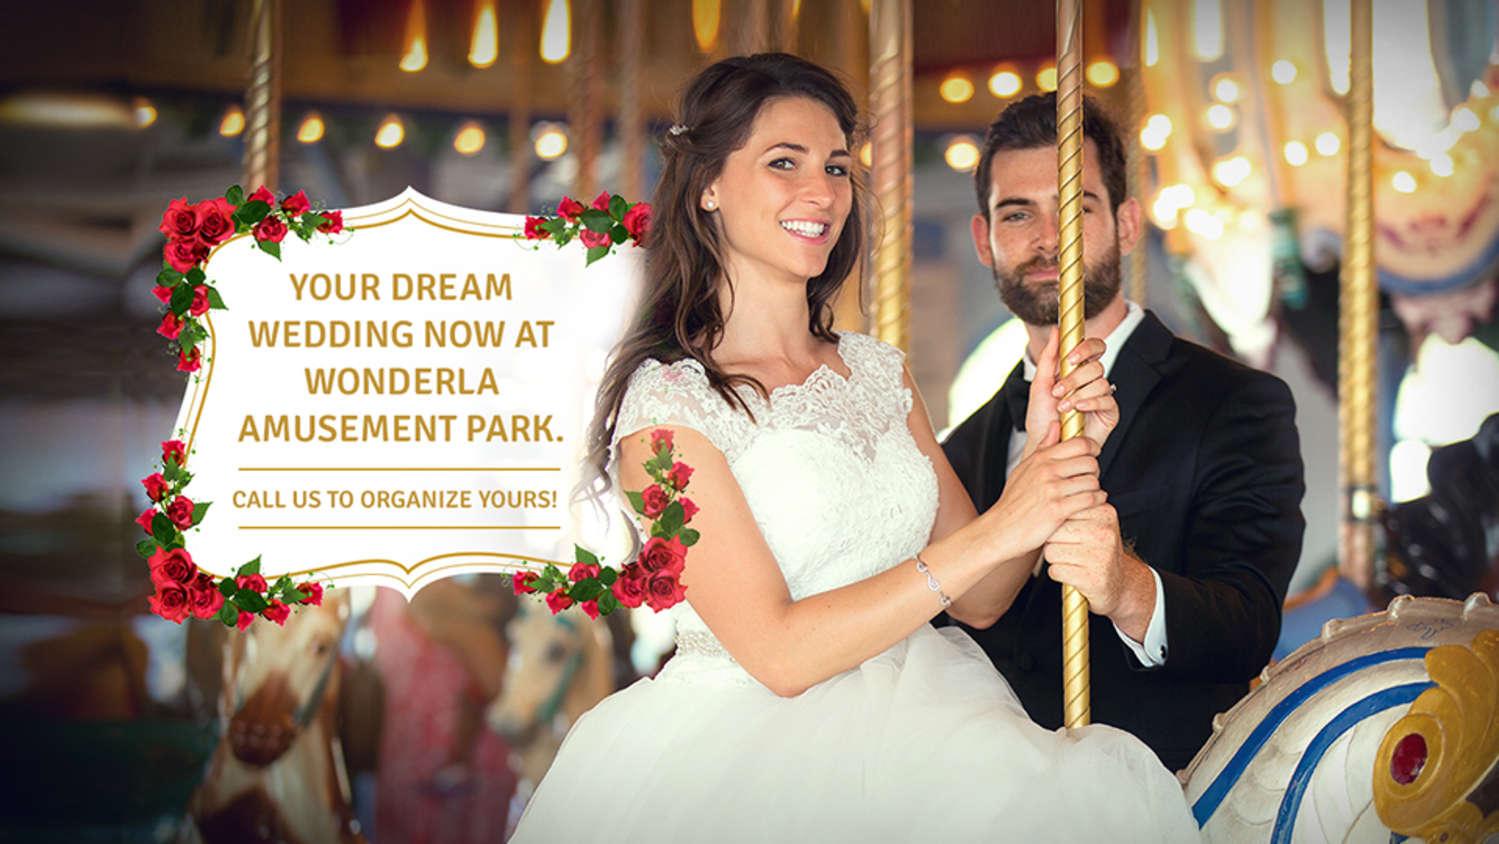 Wonderla Park Bangalore| Amusement Parks and Family Fun in Bangalore